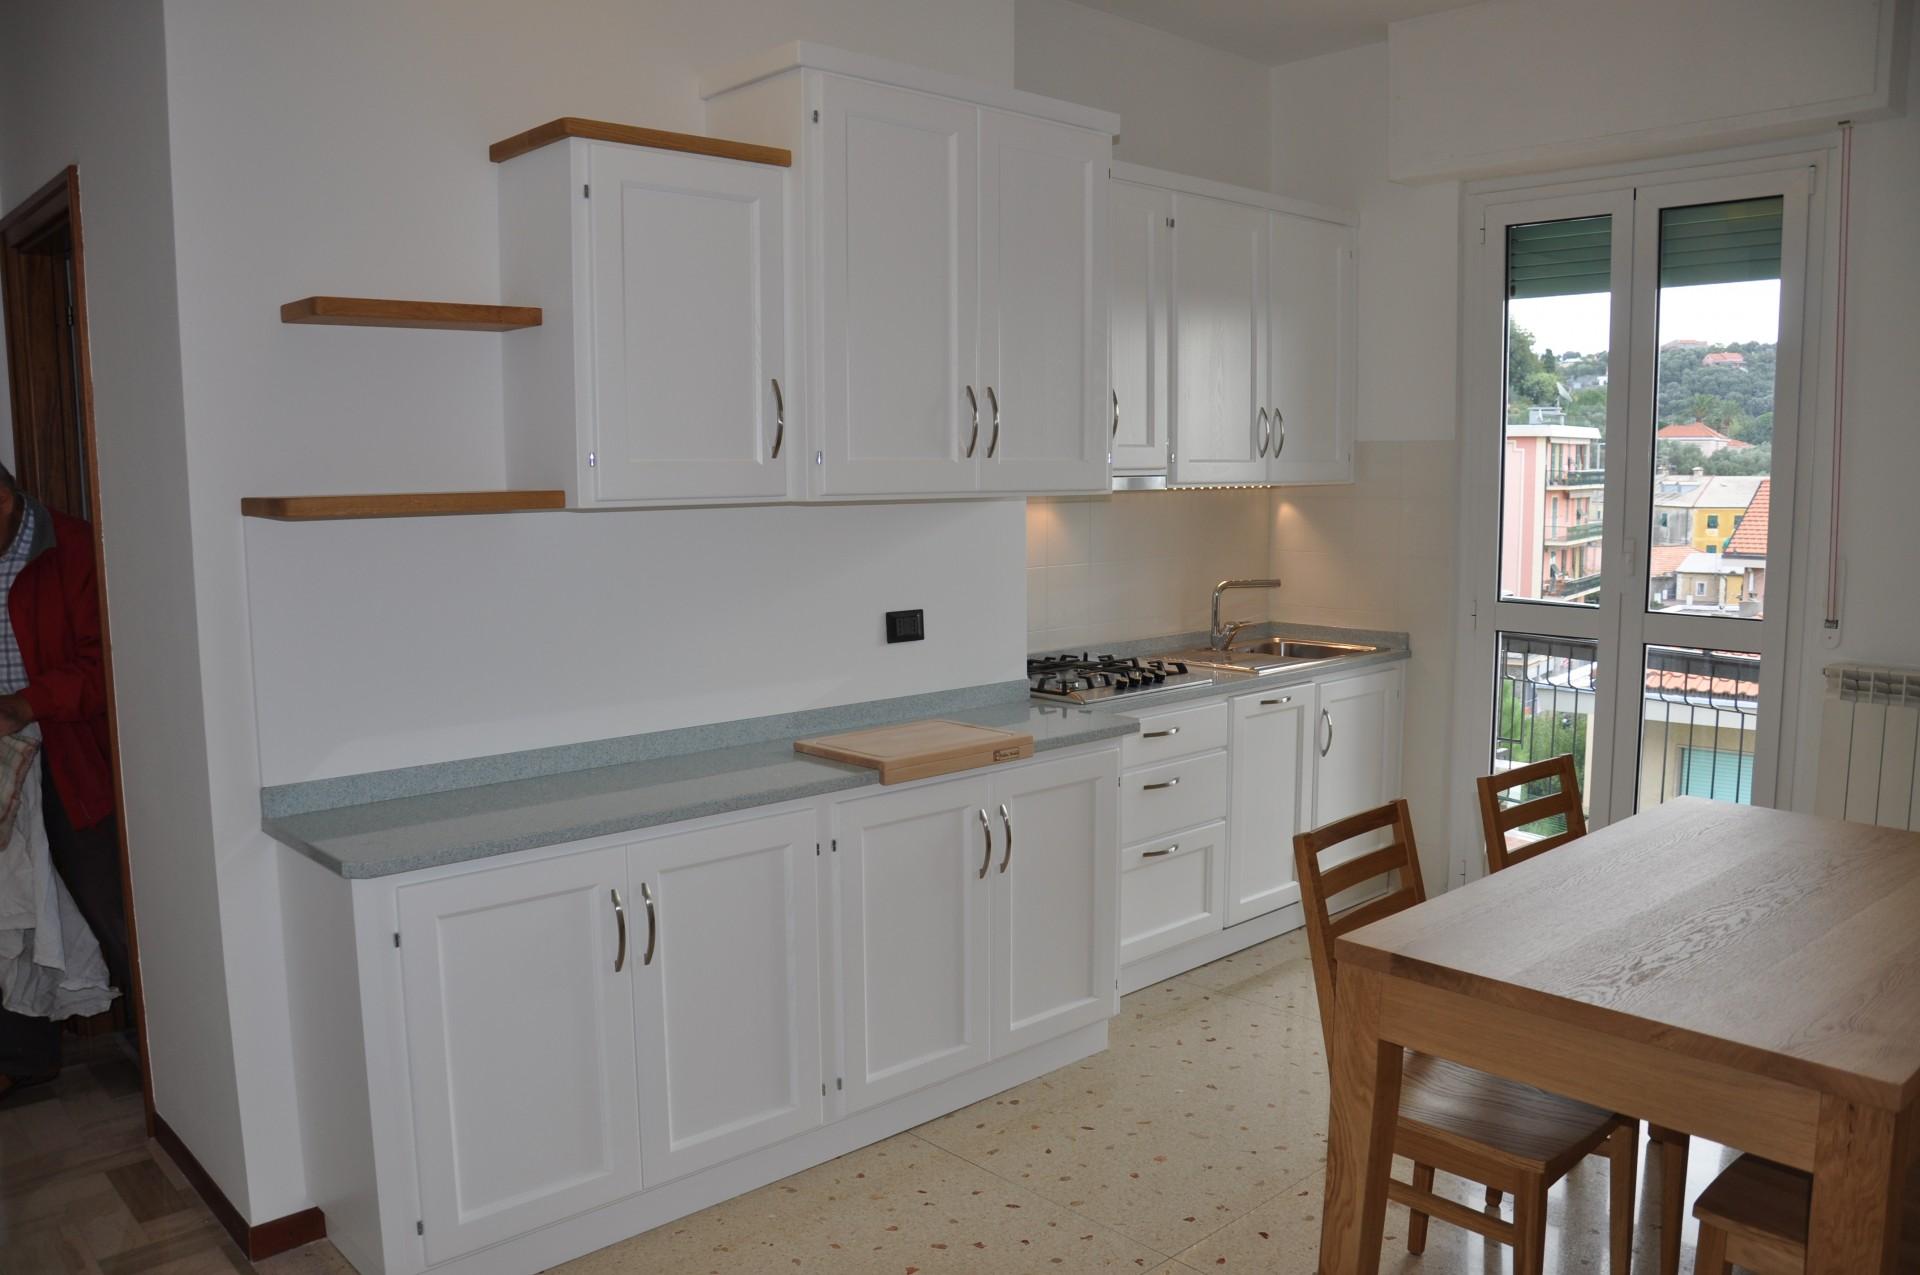 Cucine moderne fadini mobili cerea verona - Mobili cucina su misura ...